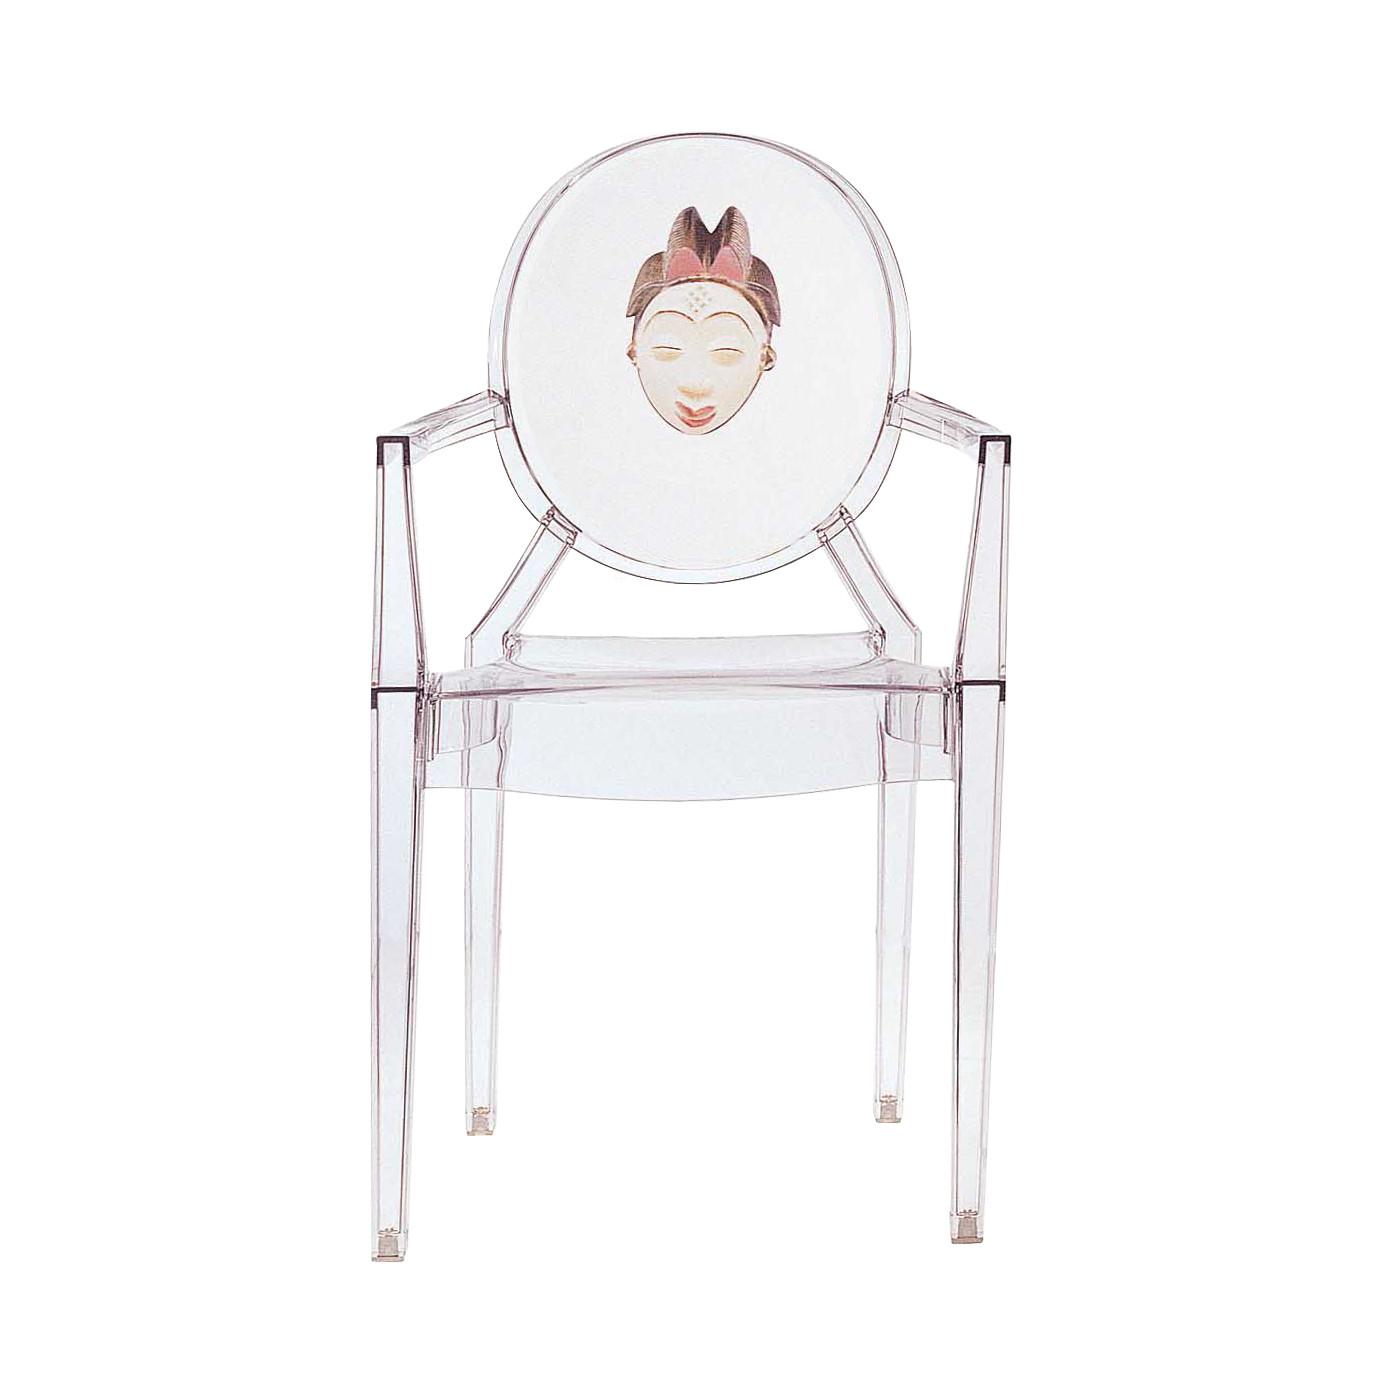 Fauteuil Louis Ghost De Philippe Starck kartell louis ghost 4854